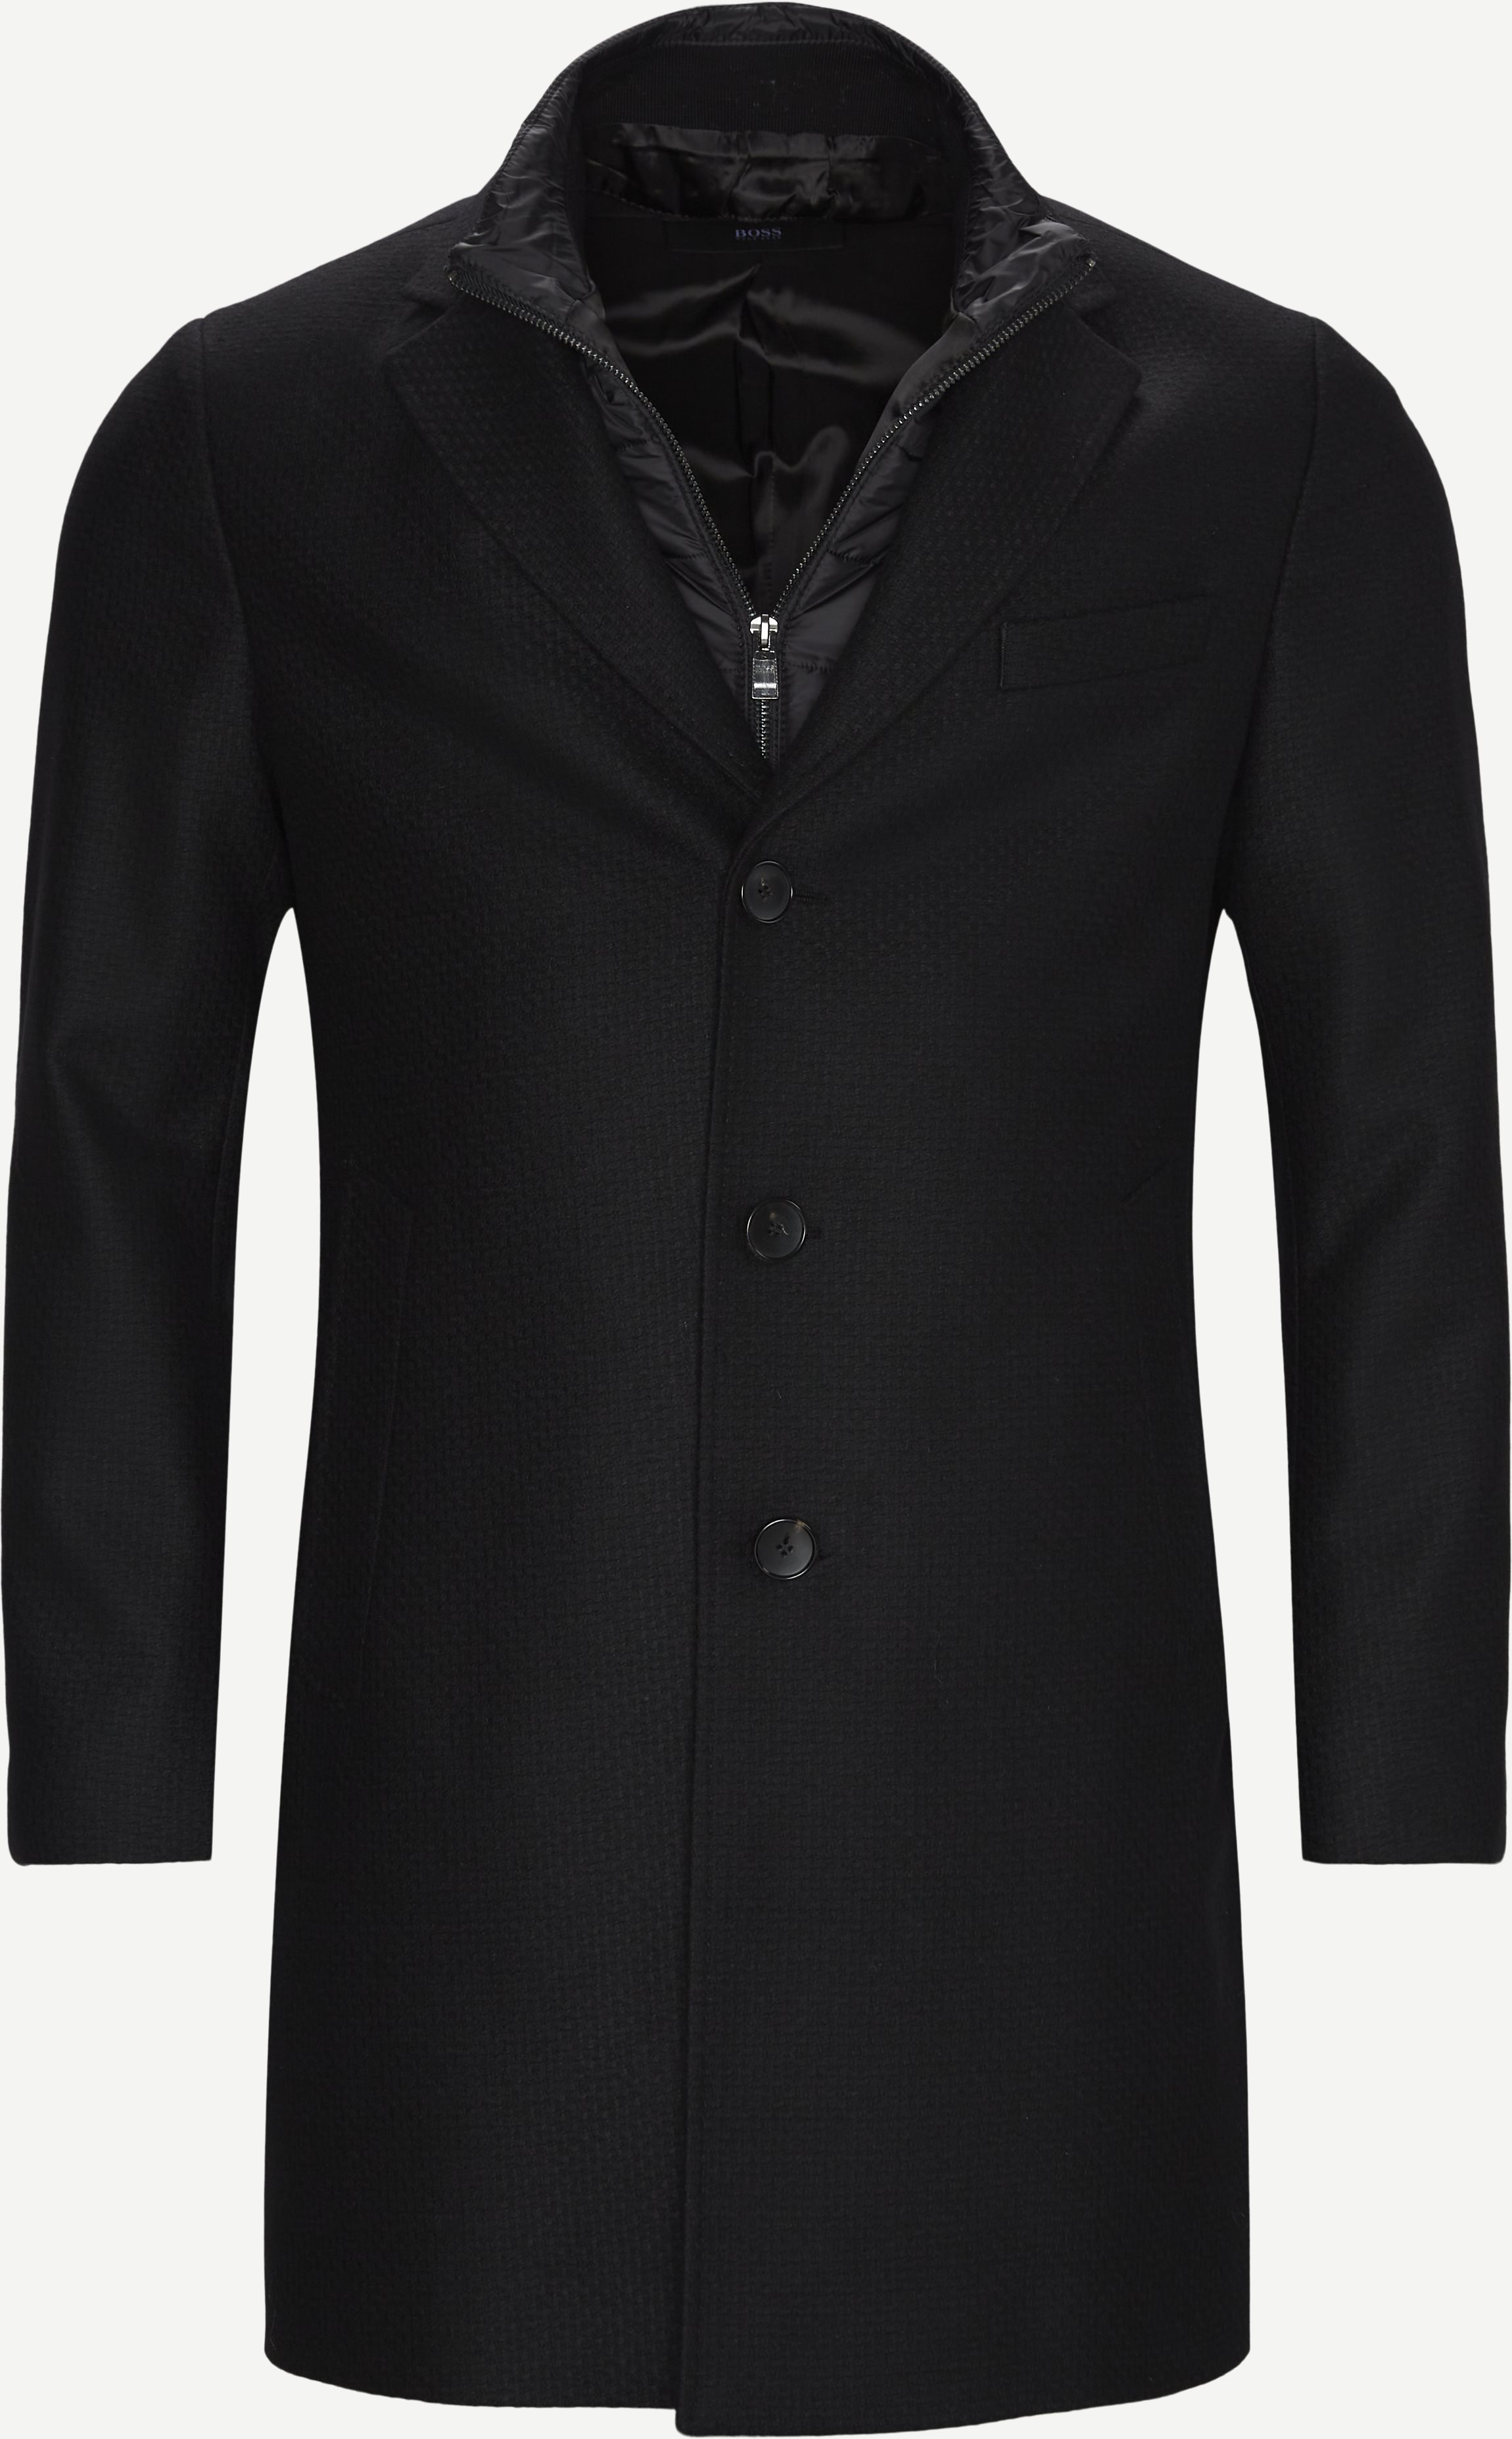 Nadim4 Jacket - Jackor - Slim - Svart